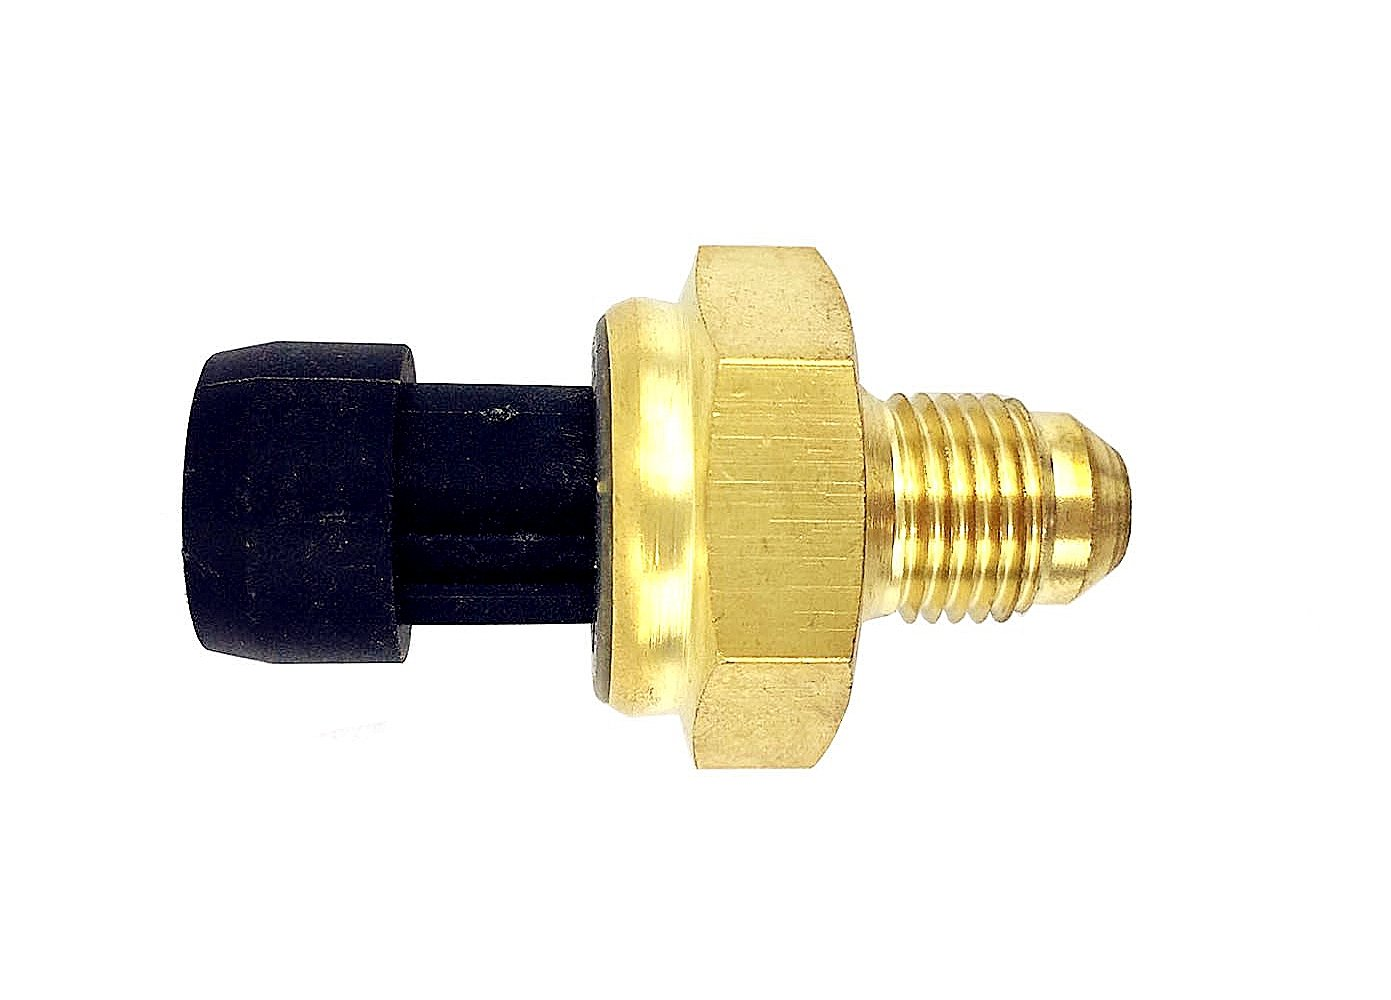 EBP Exhaust Back Pressure Sensor for 2007-2010 Navistar MaxxForce DT 9 10 for Ford Powerstroke 6.4L 2008-2010 Replaces 1846480C2 8C3Z9J460A Top Quality